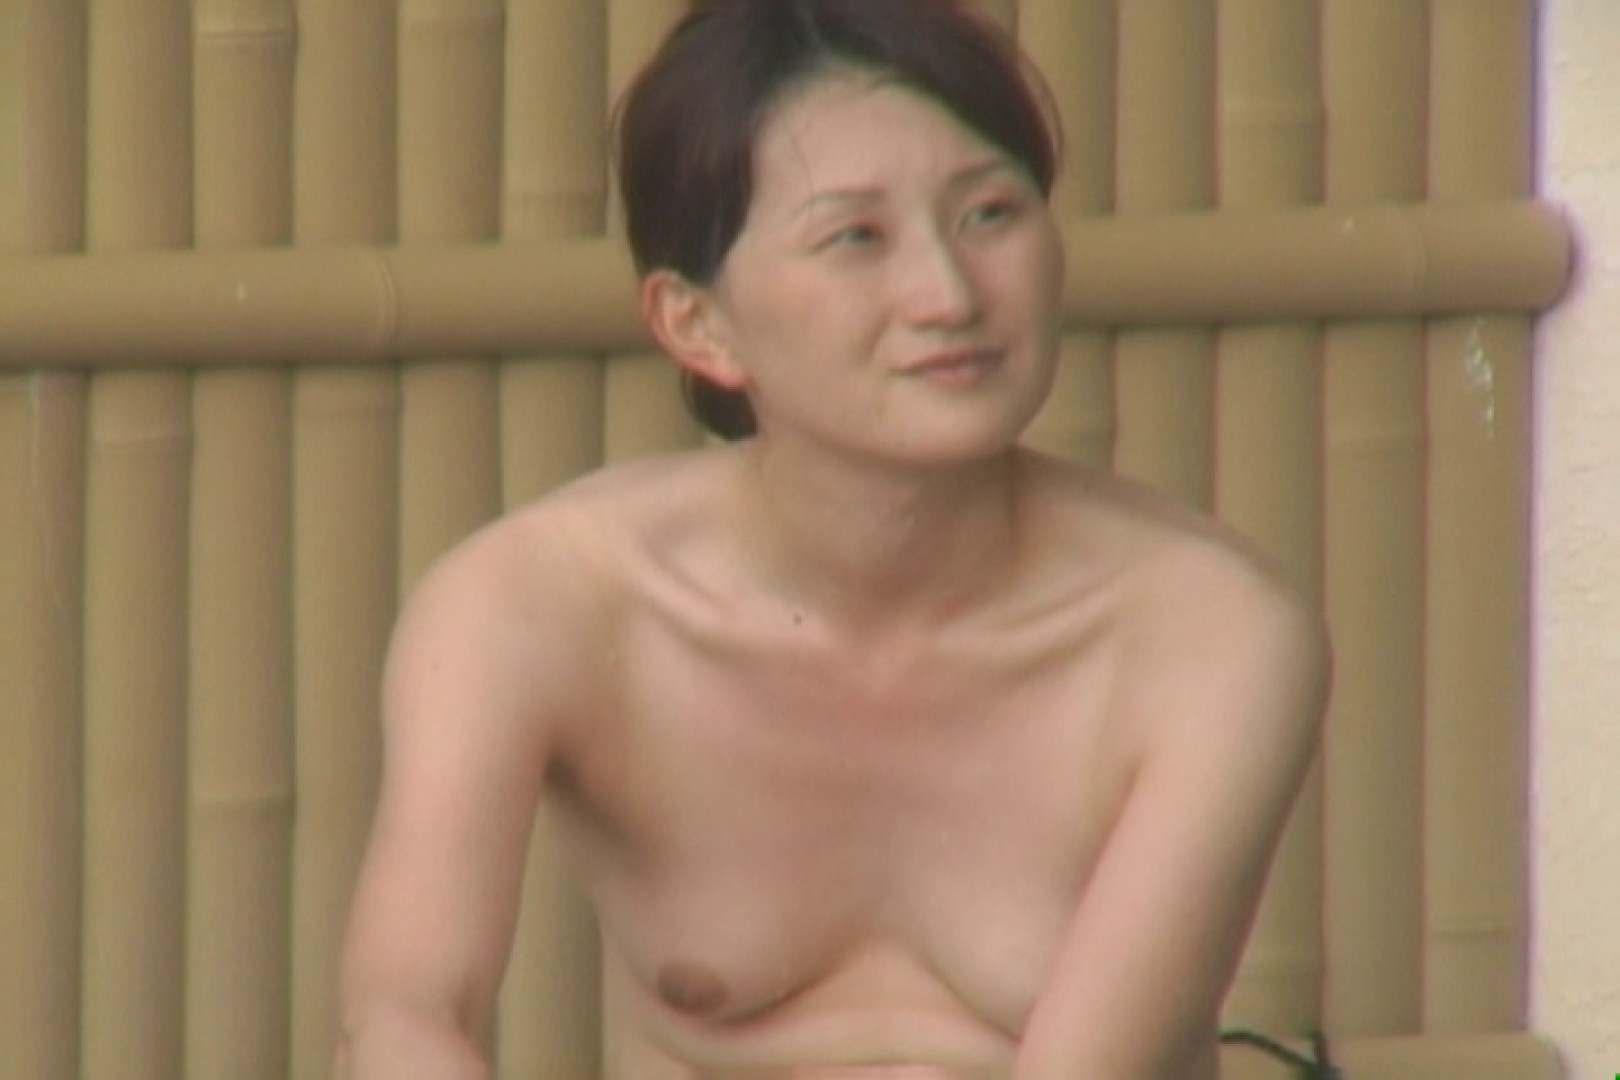 Aquaな露天風呂Vol.578 OL女体 われめAV動画紹介 77連発 41